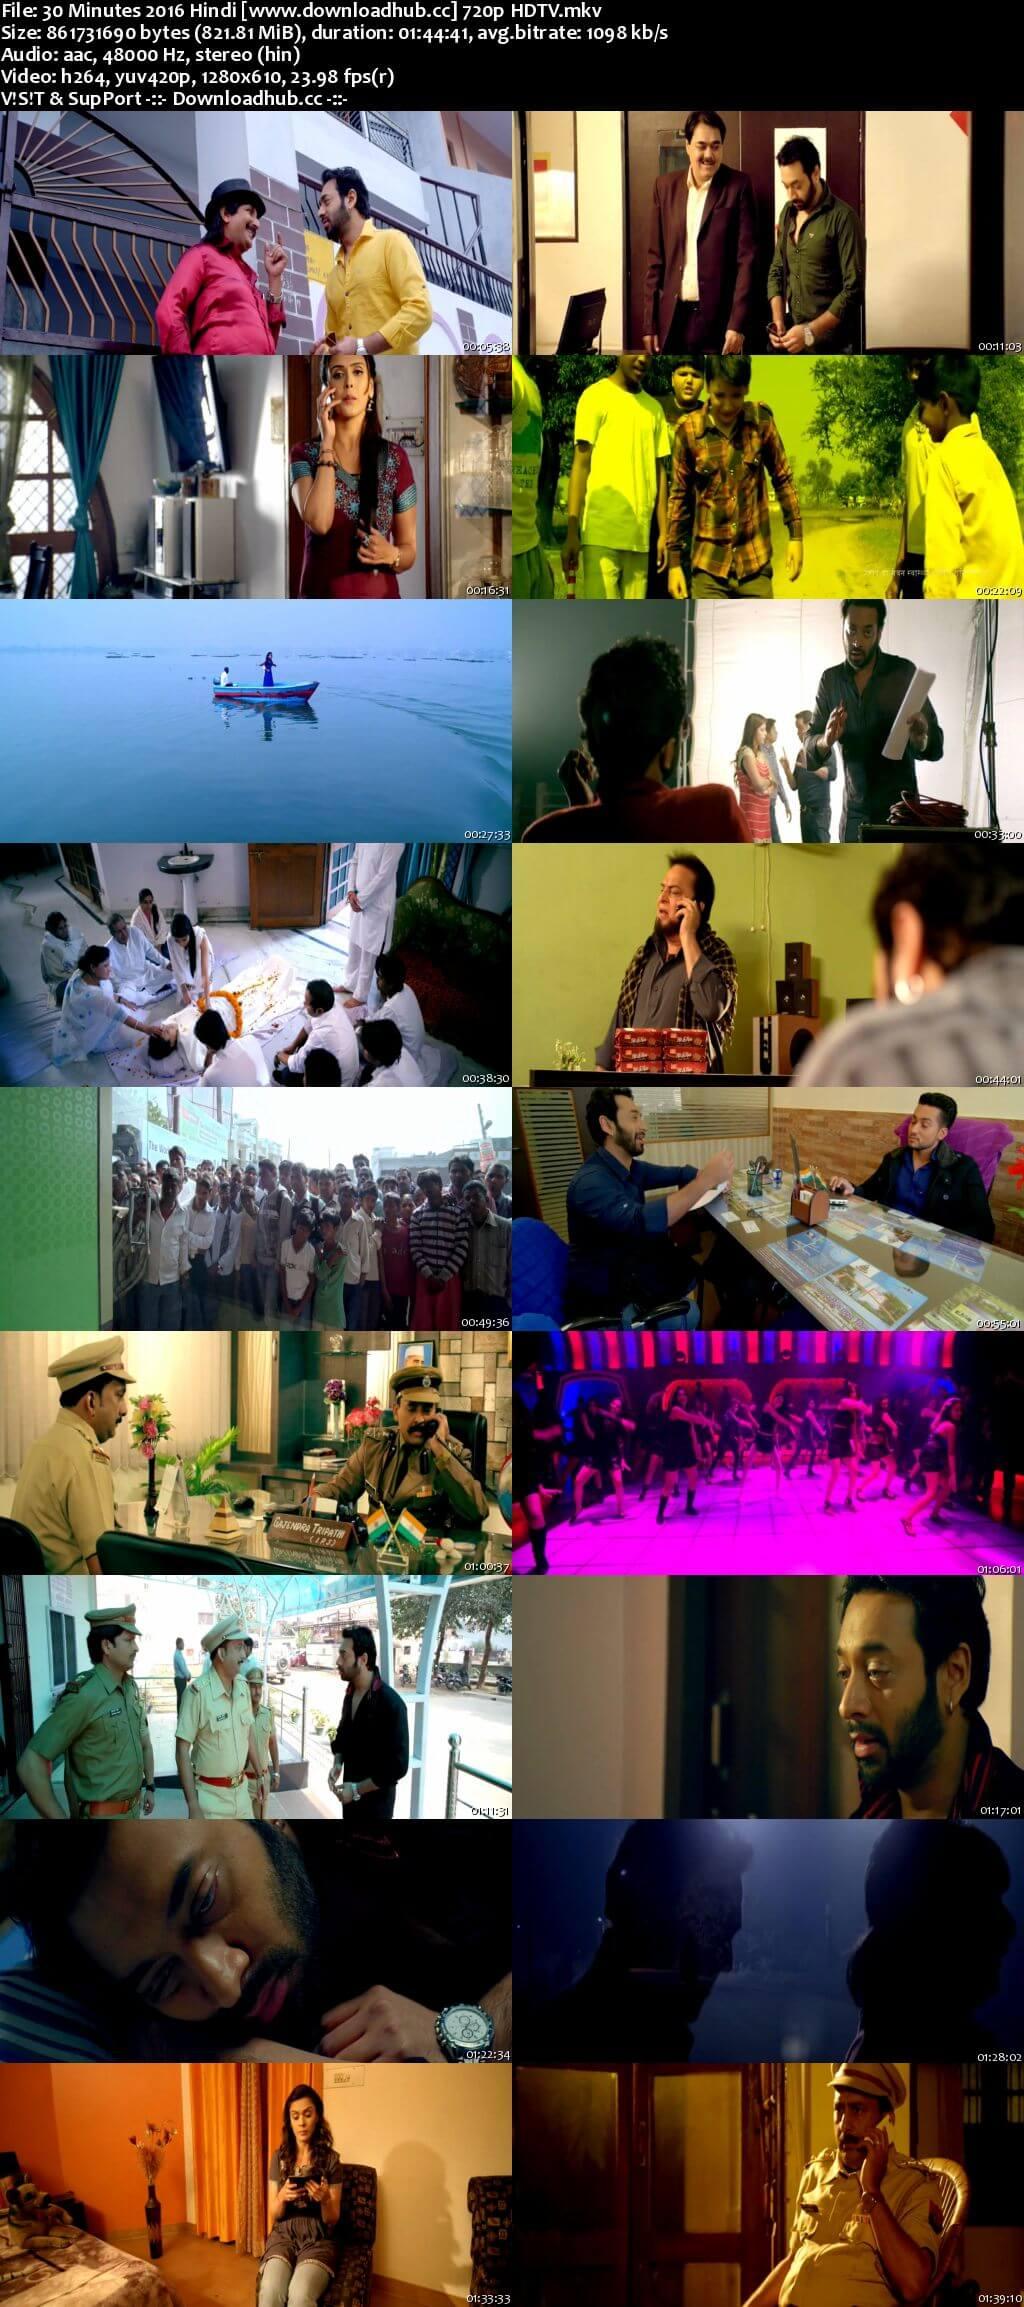 30 Minutes 2016 Hindi 720p HDTV x264